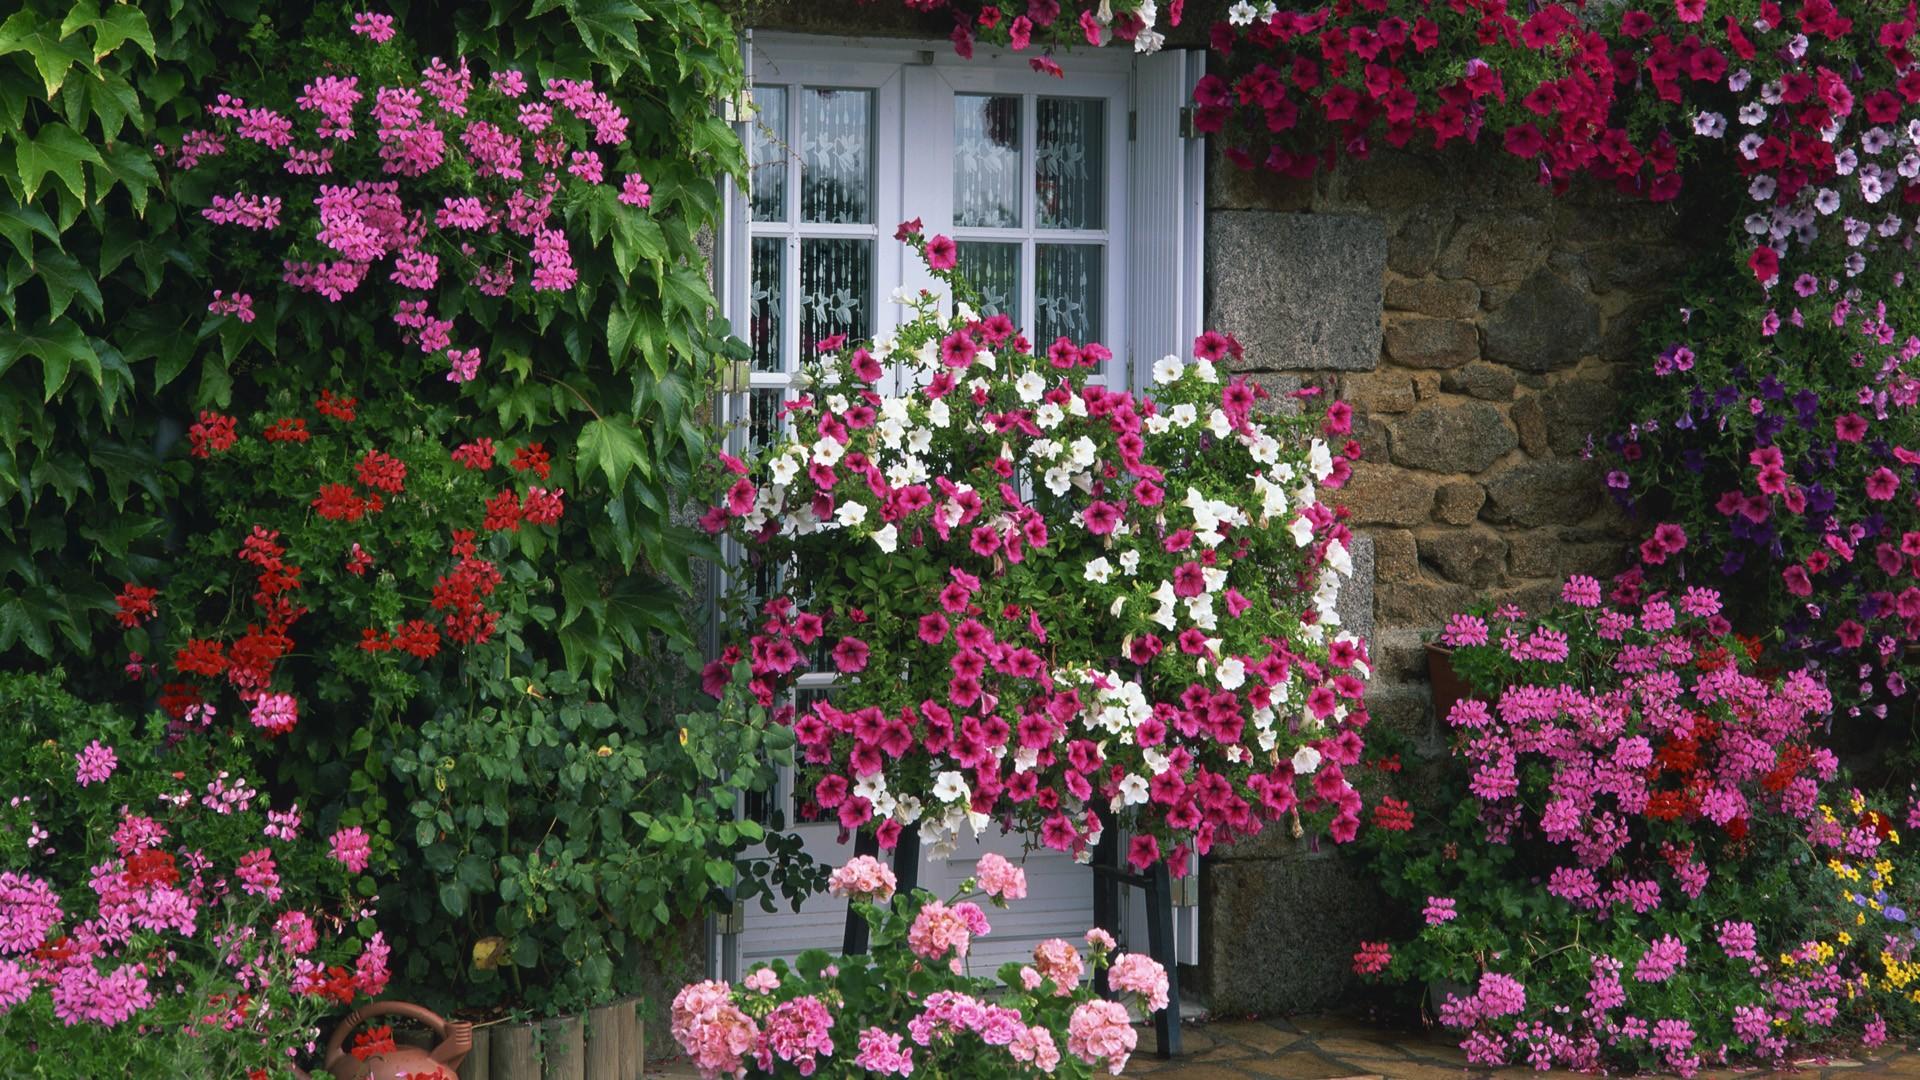 [46+] Free Summer Garden Desktop Wallpaper On WallpaperSafari